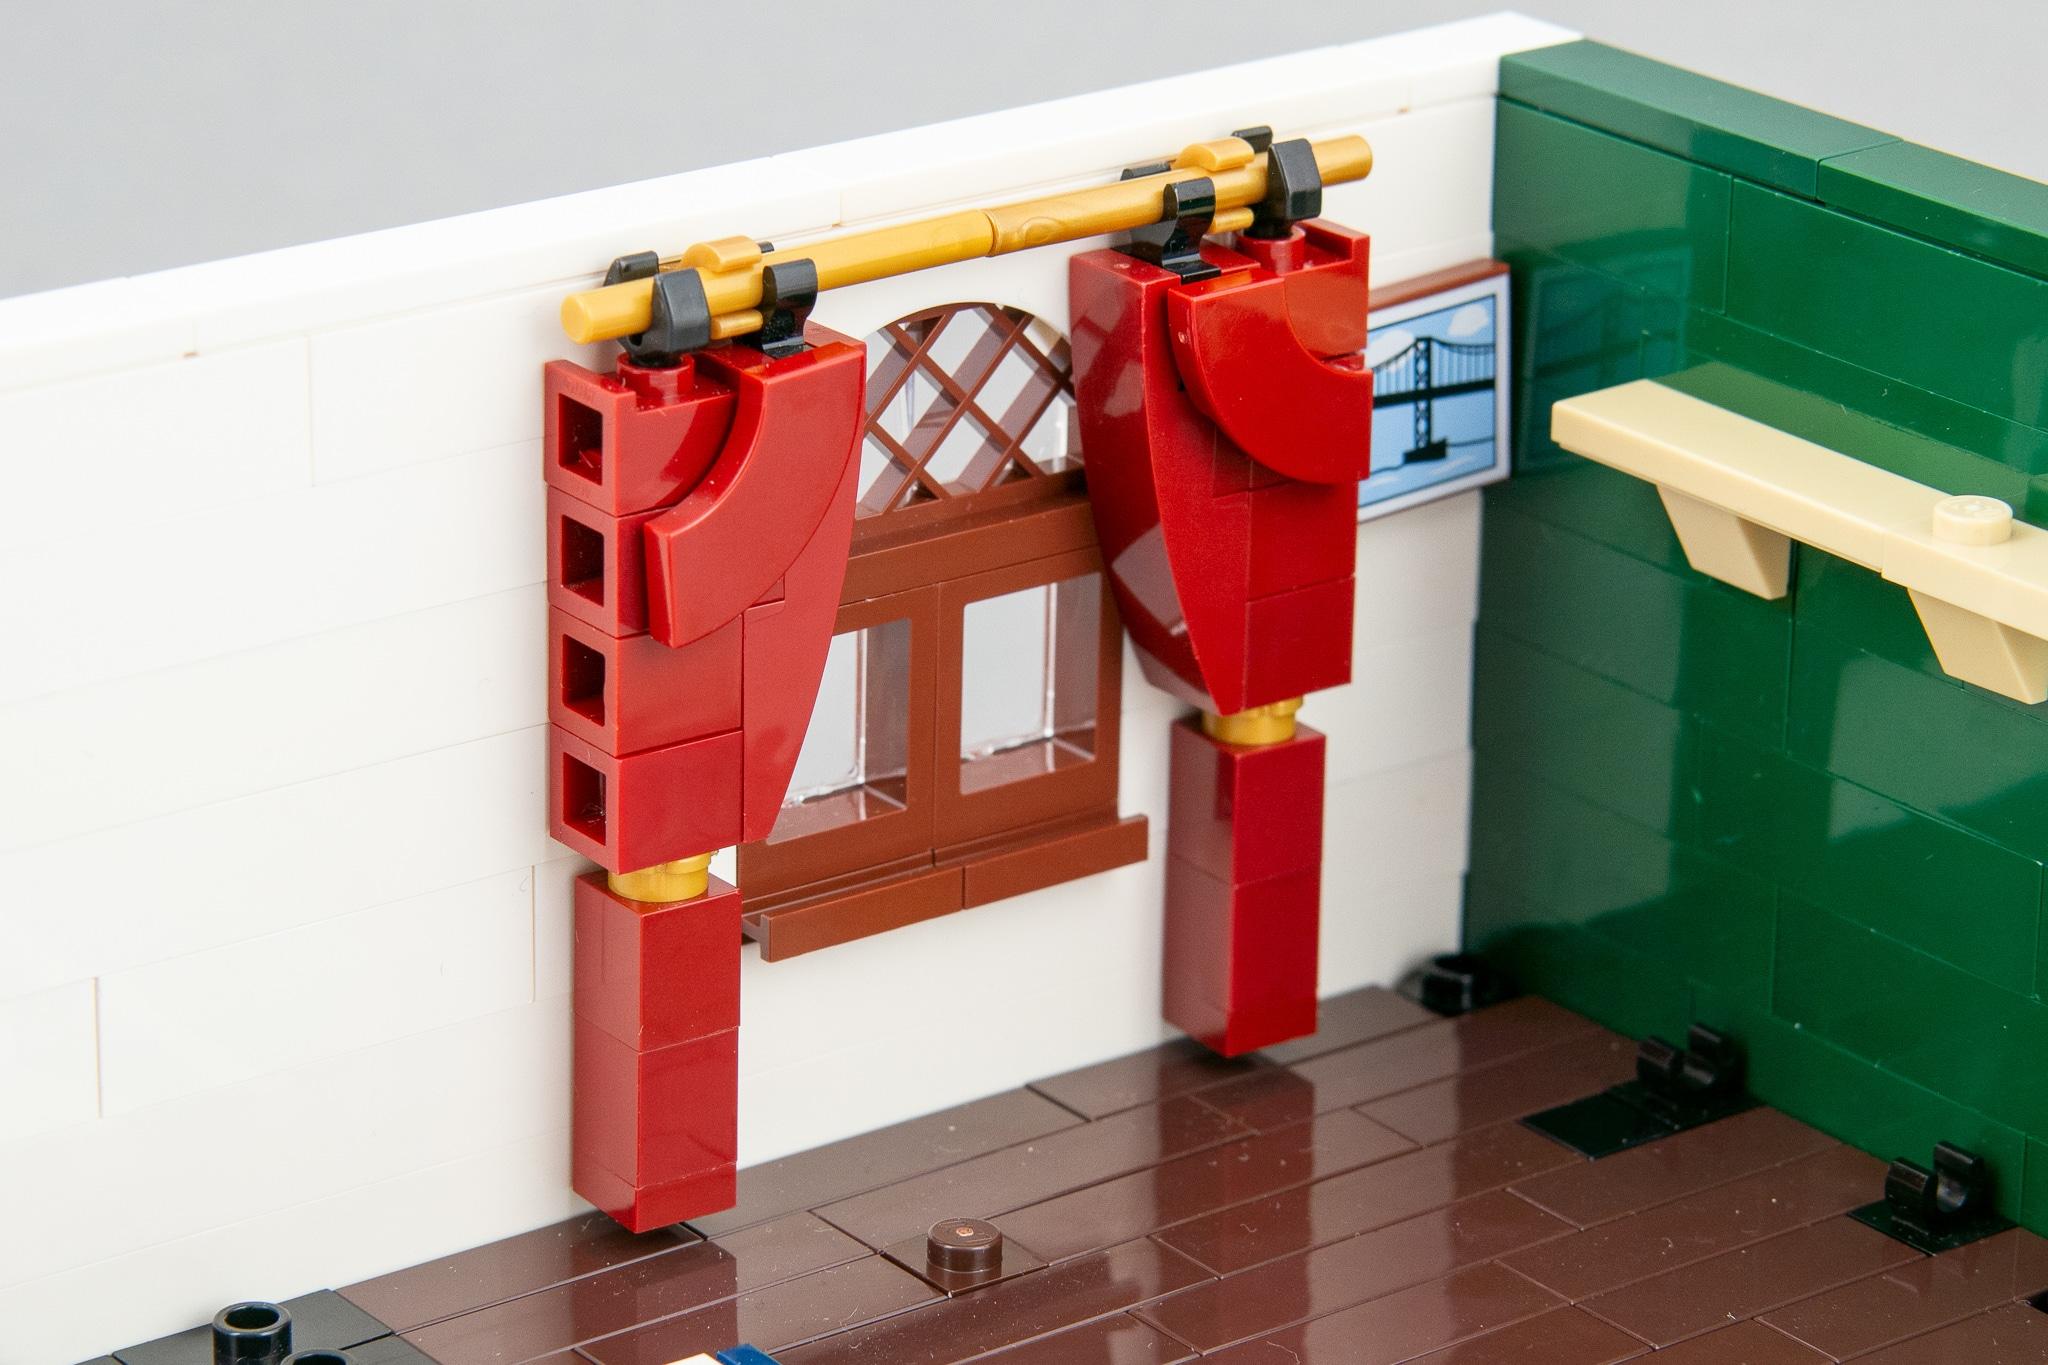 LEGO Schlafzimmer Moc (16)